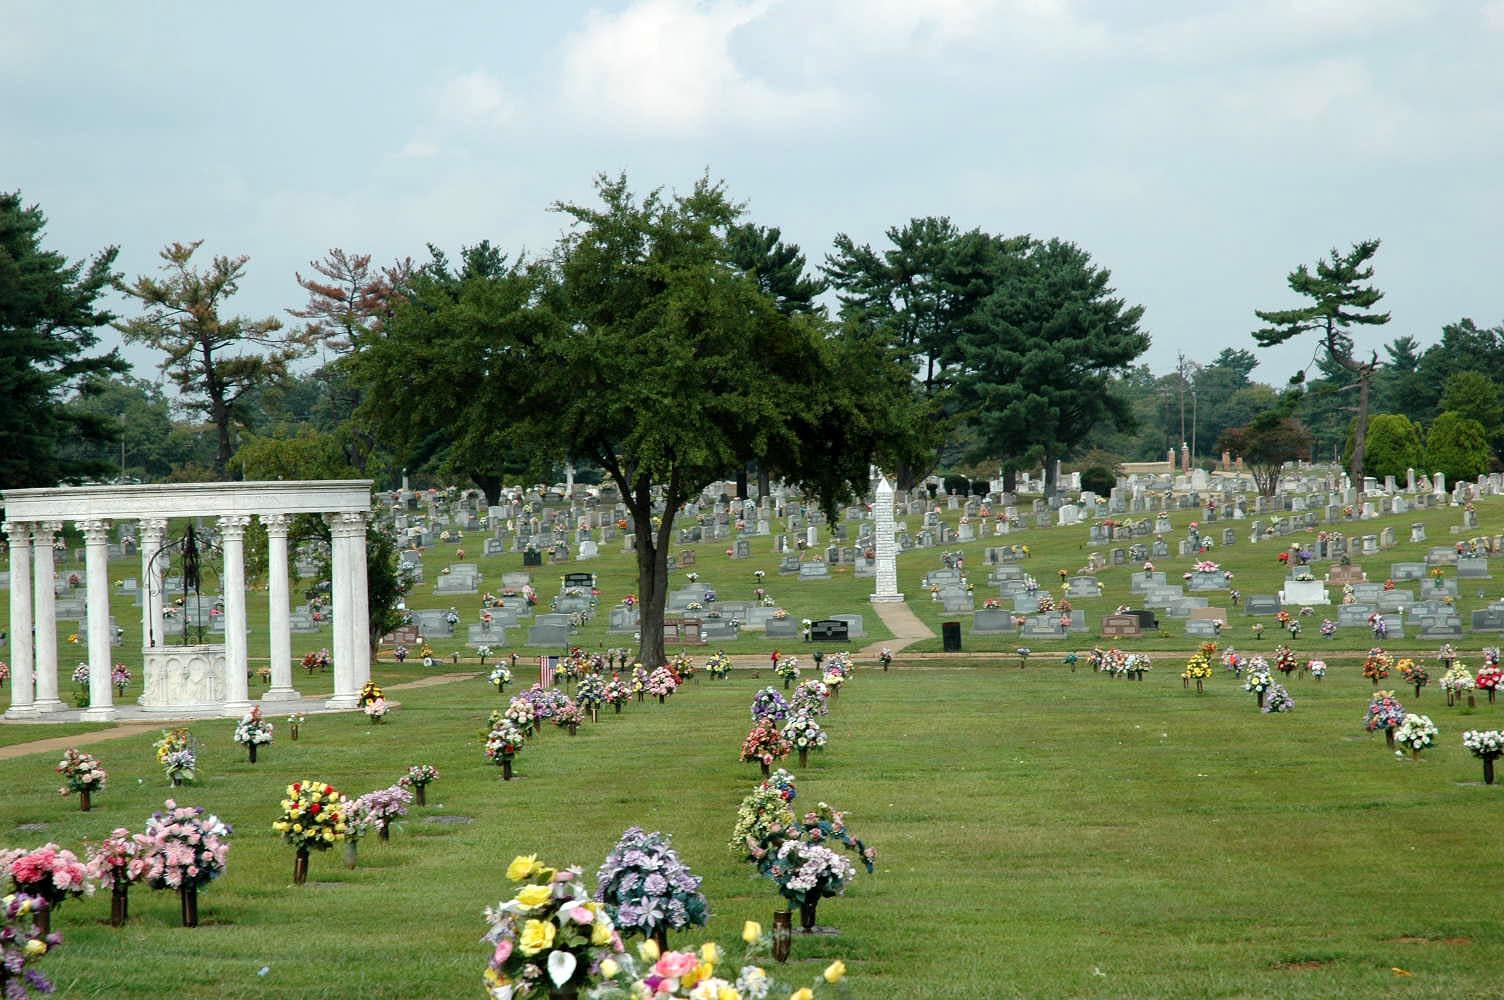 Graceland West Cemetery and Mausoleum